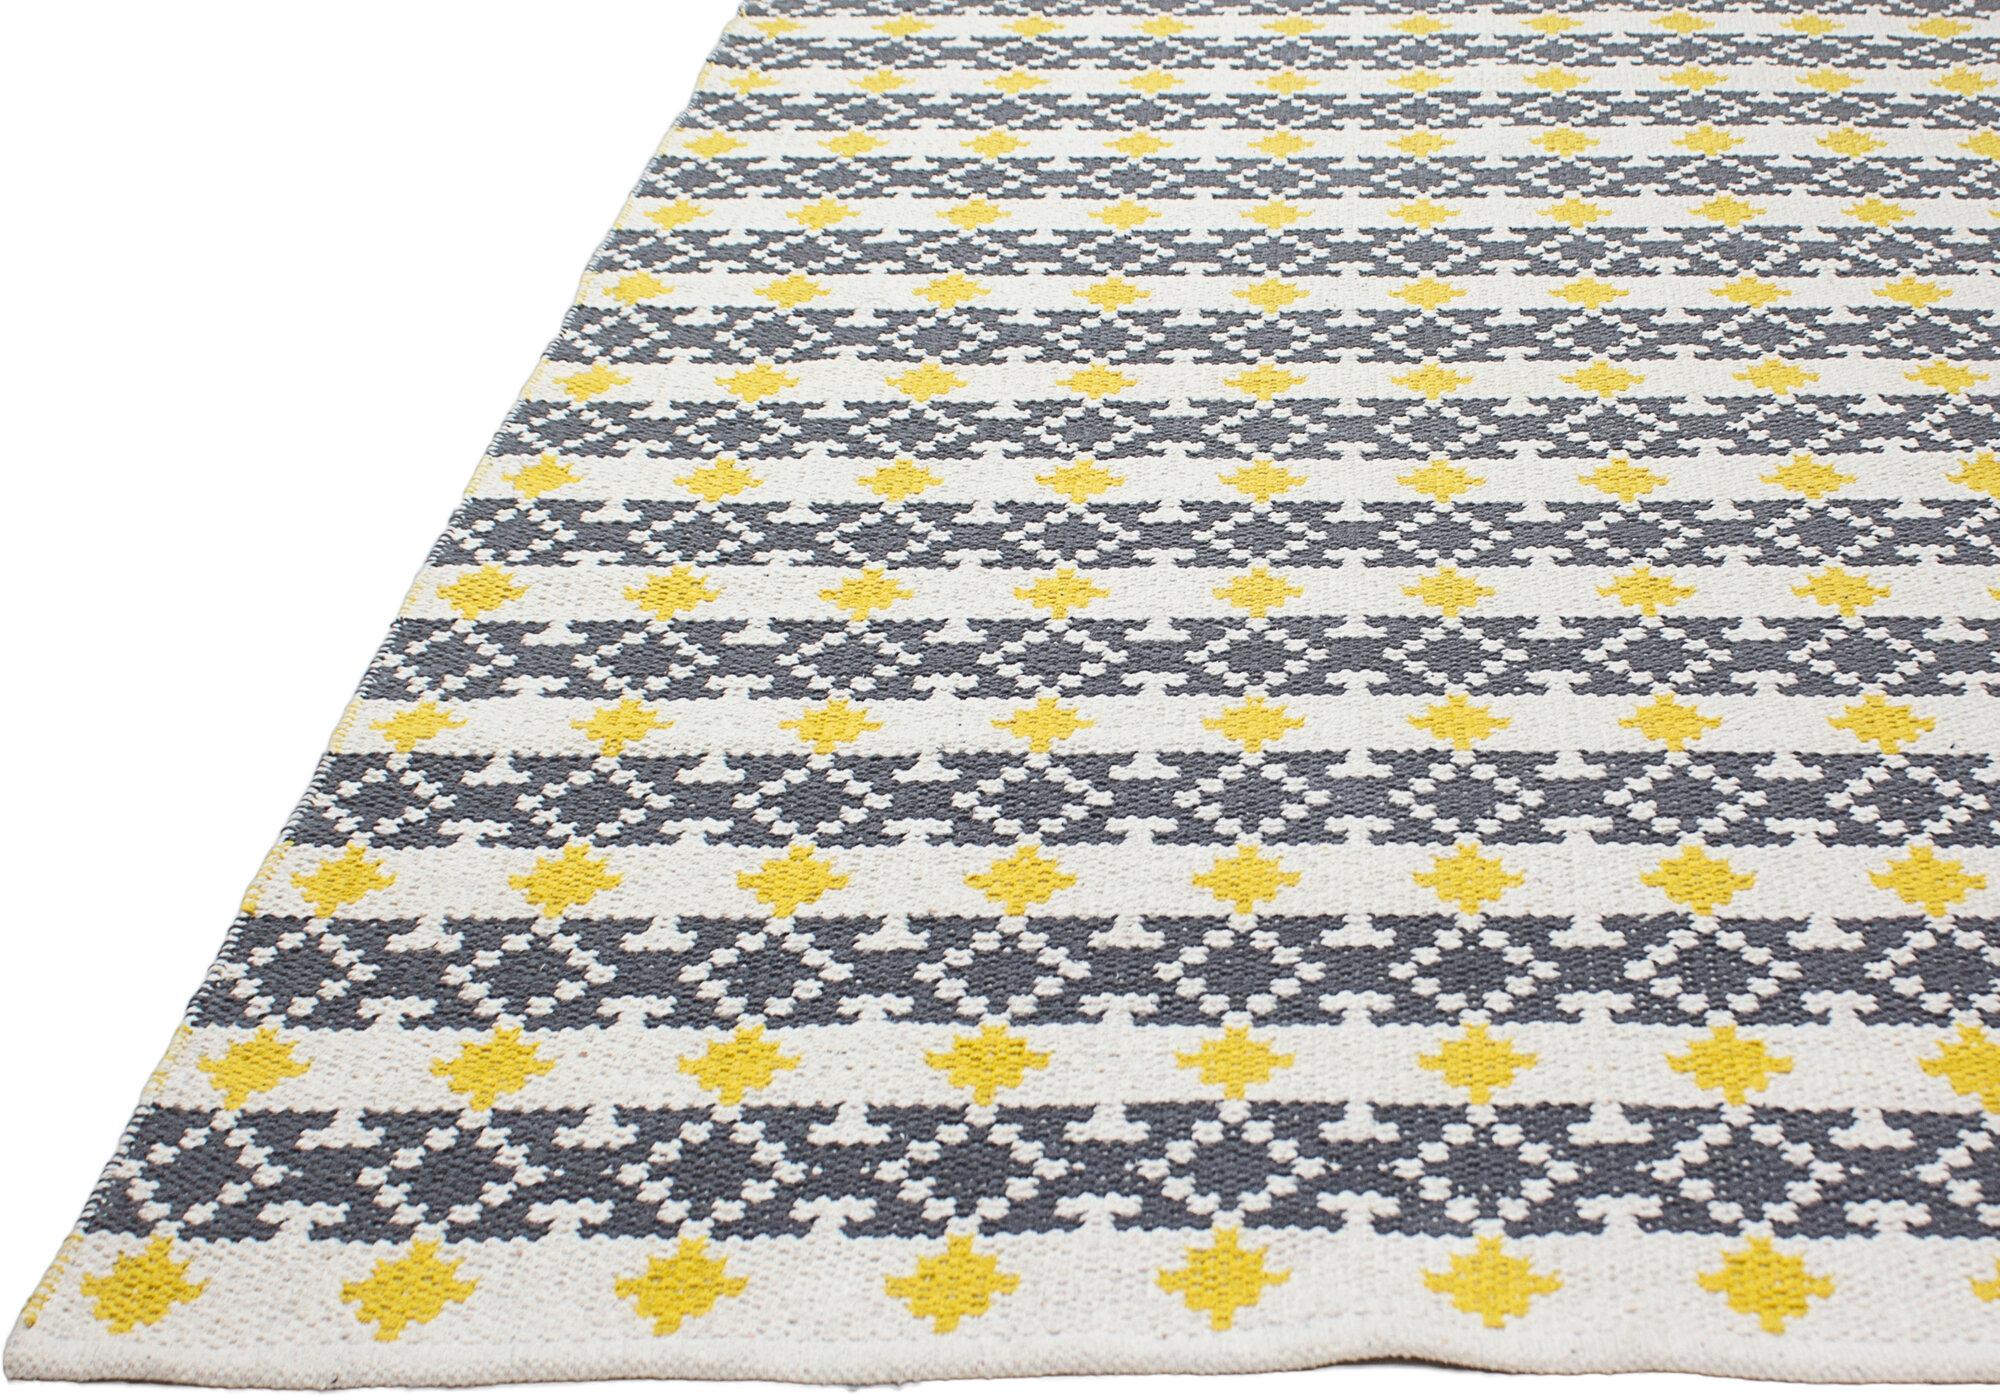 fab habitat estate hand woven yellow gray indoor outdoor area rug ebay. Black Bedroom Furniture Sets. Home Design Ideas